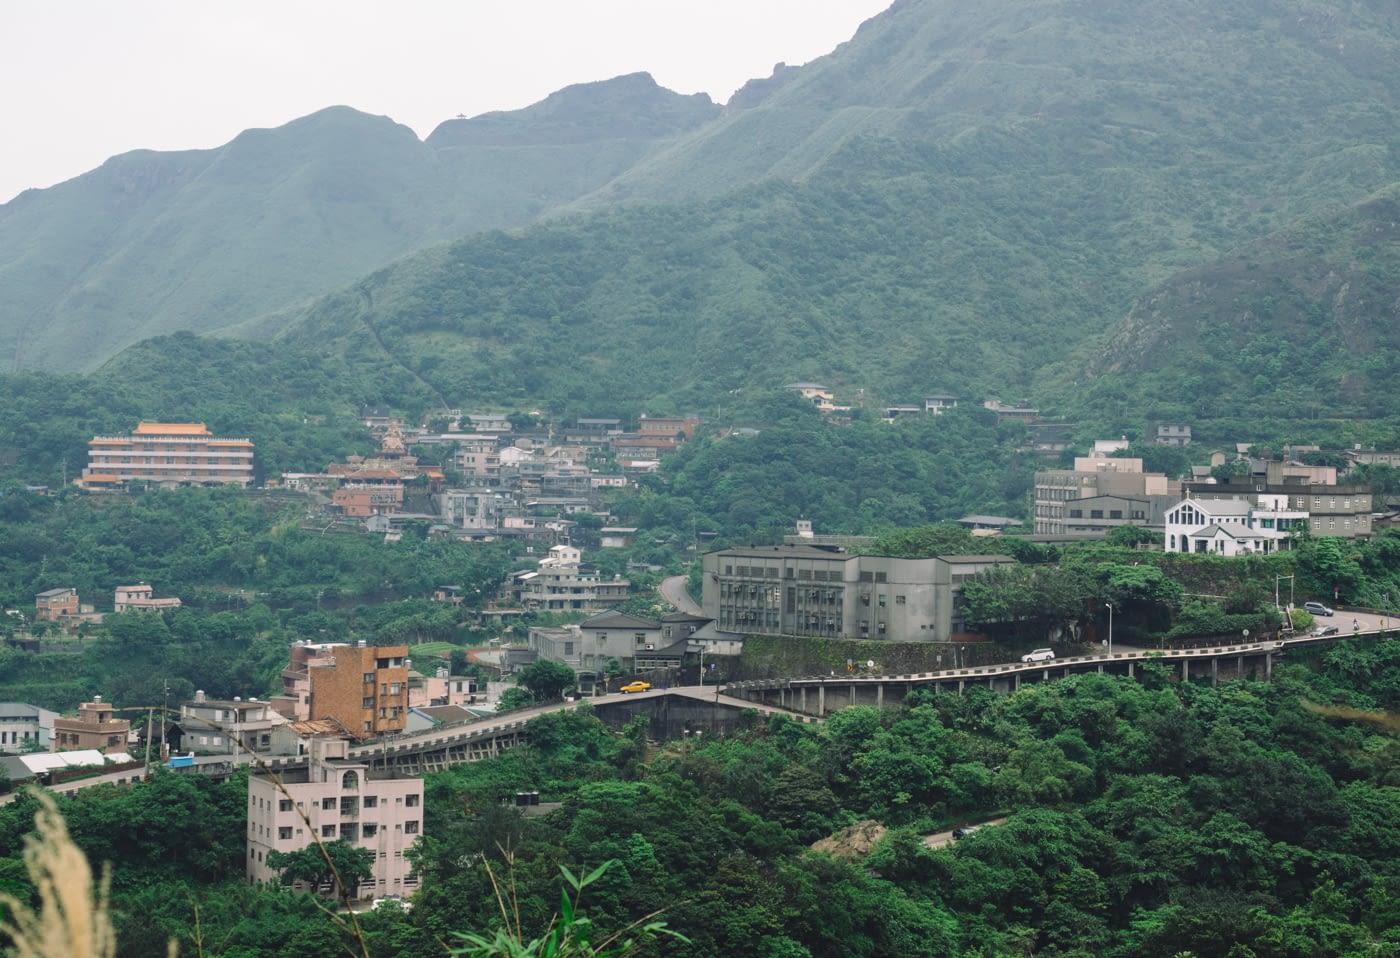 Taiwan - New Taipei City - Houses along the mountains